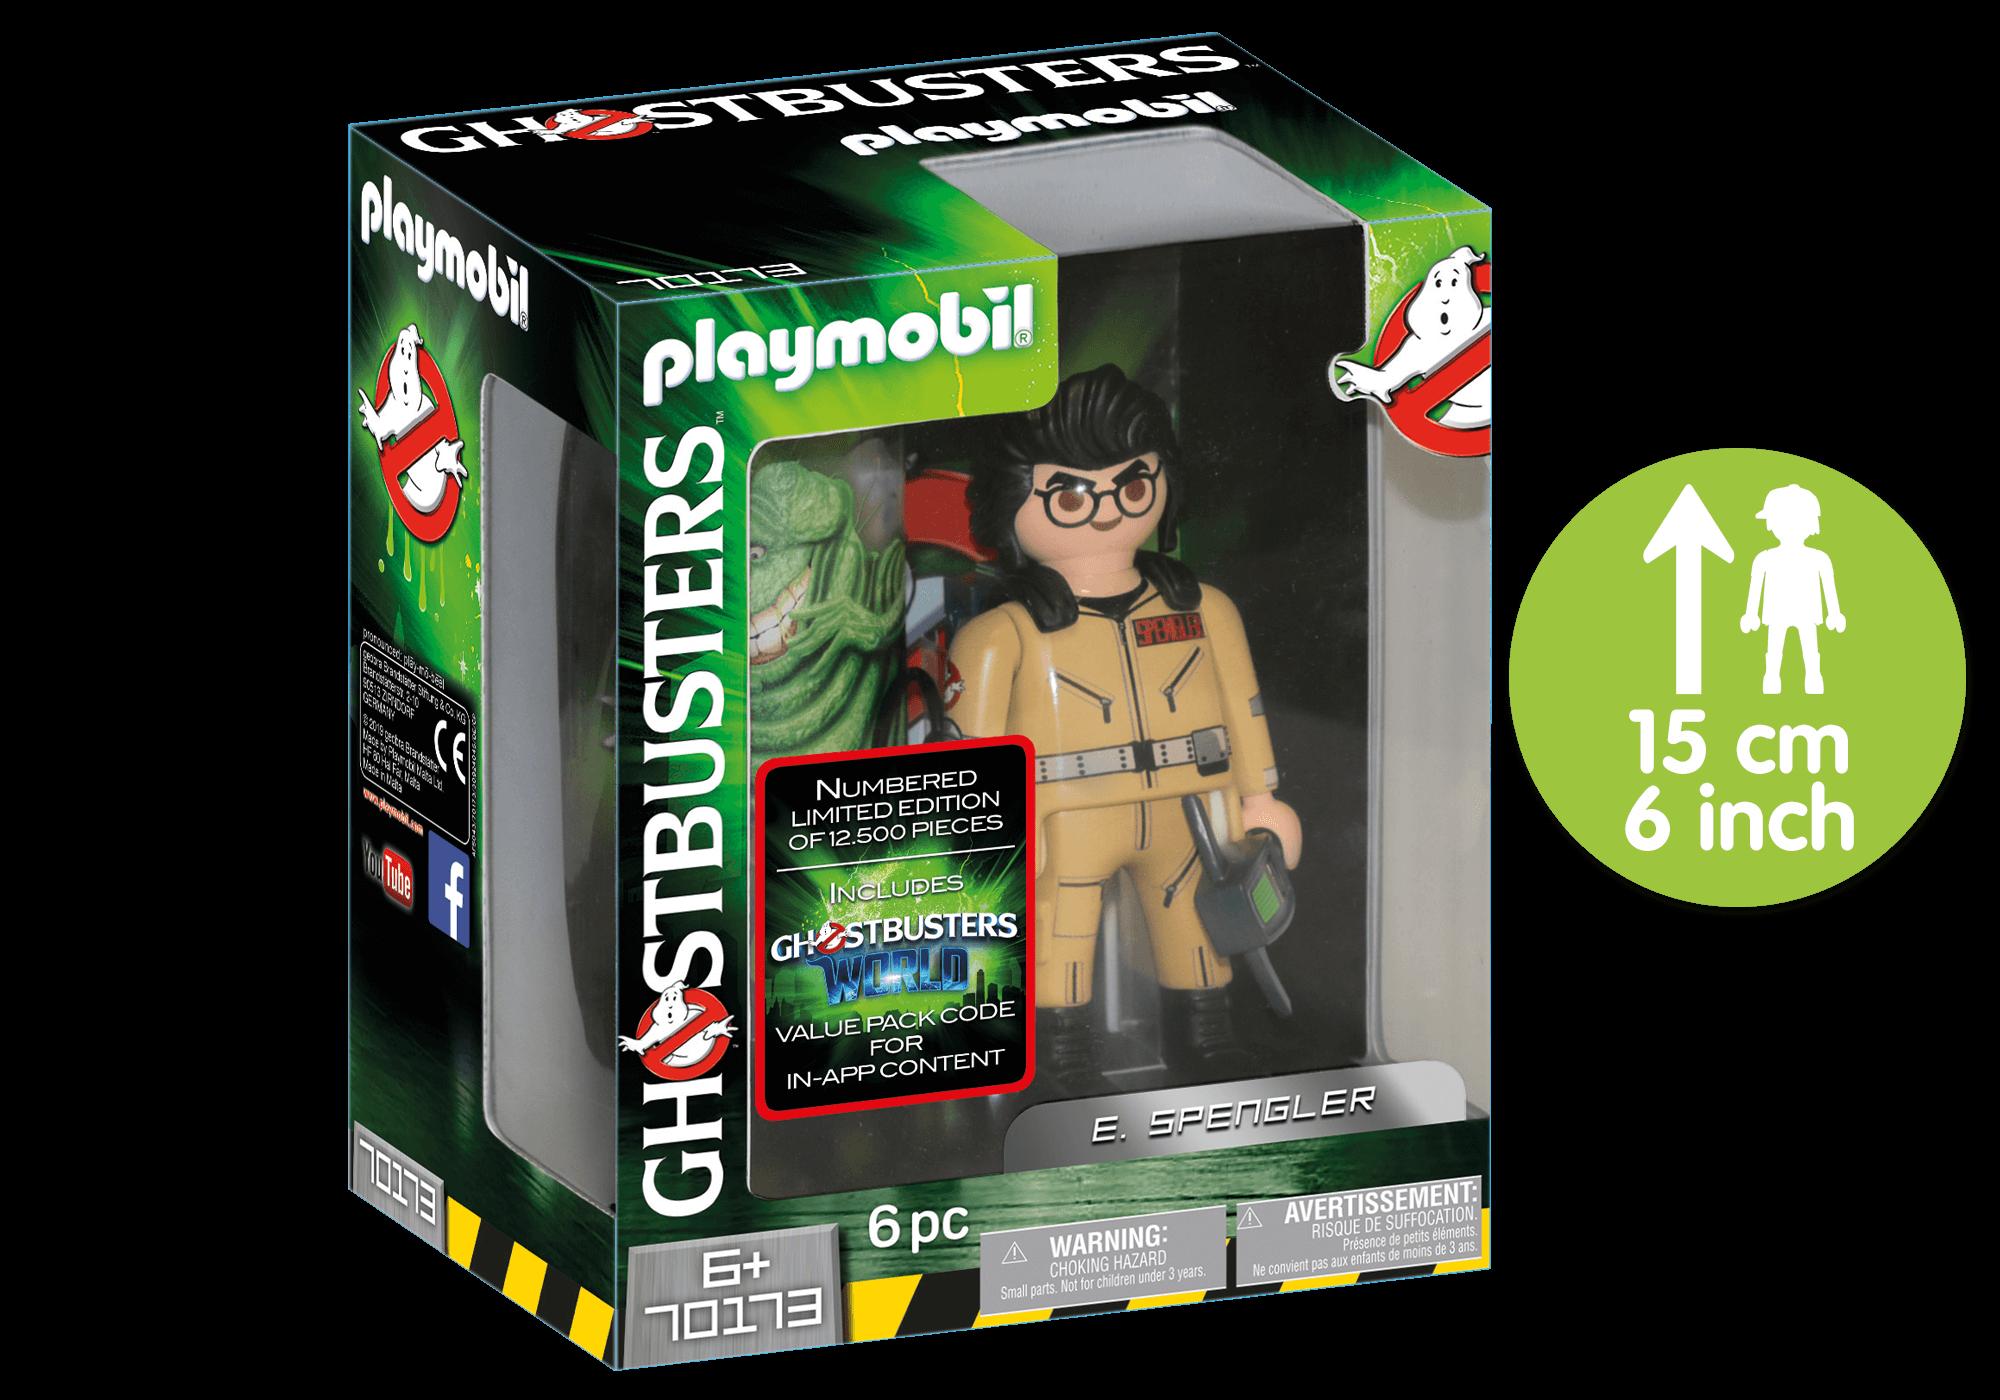 http://media.playmobil.com/i/playmobil/70173_product_detail/Ghostbusters™ Figurka do kolekcjonowania E. Spengler